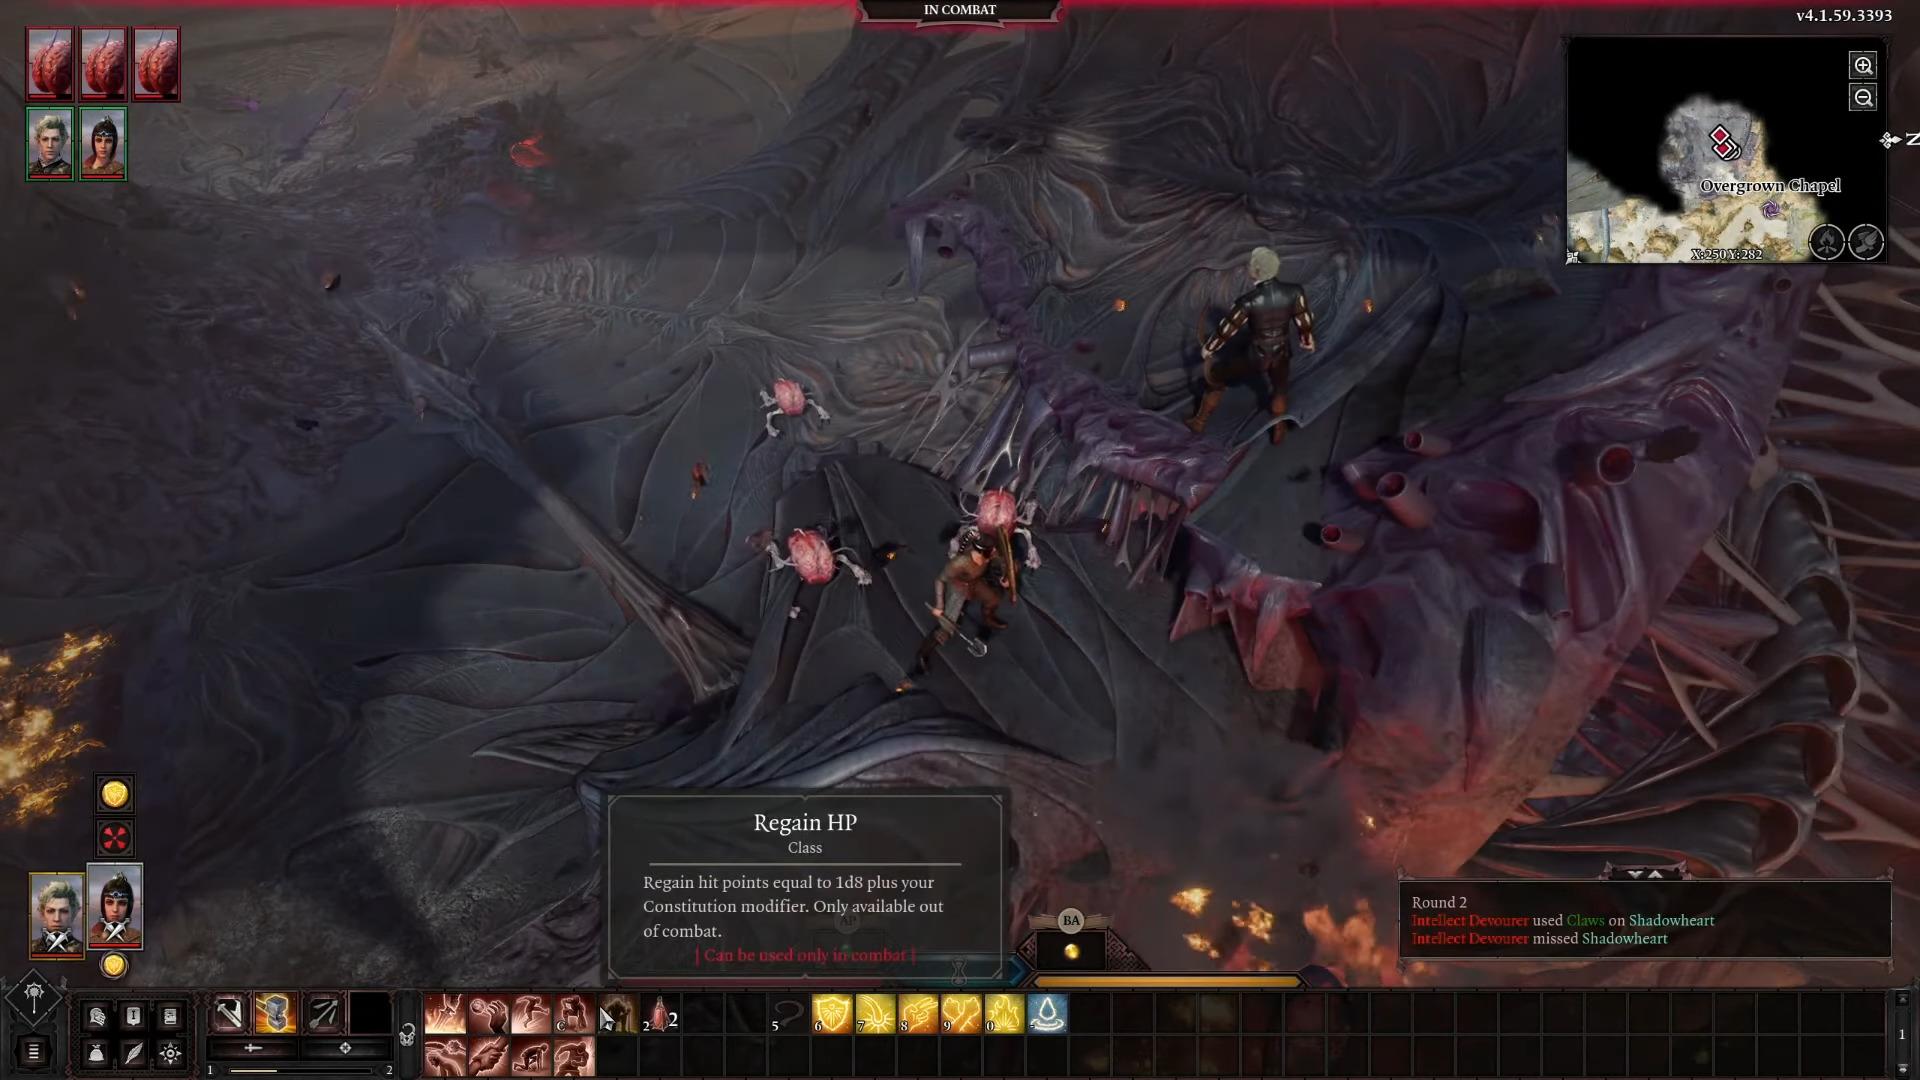 Combat Baldur's Gate 3